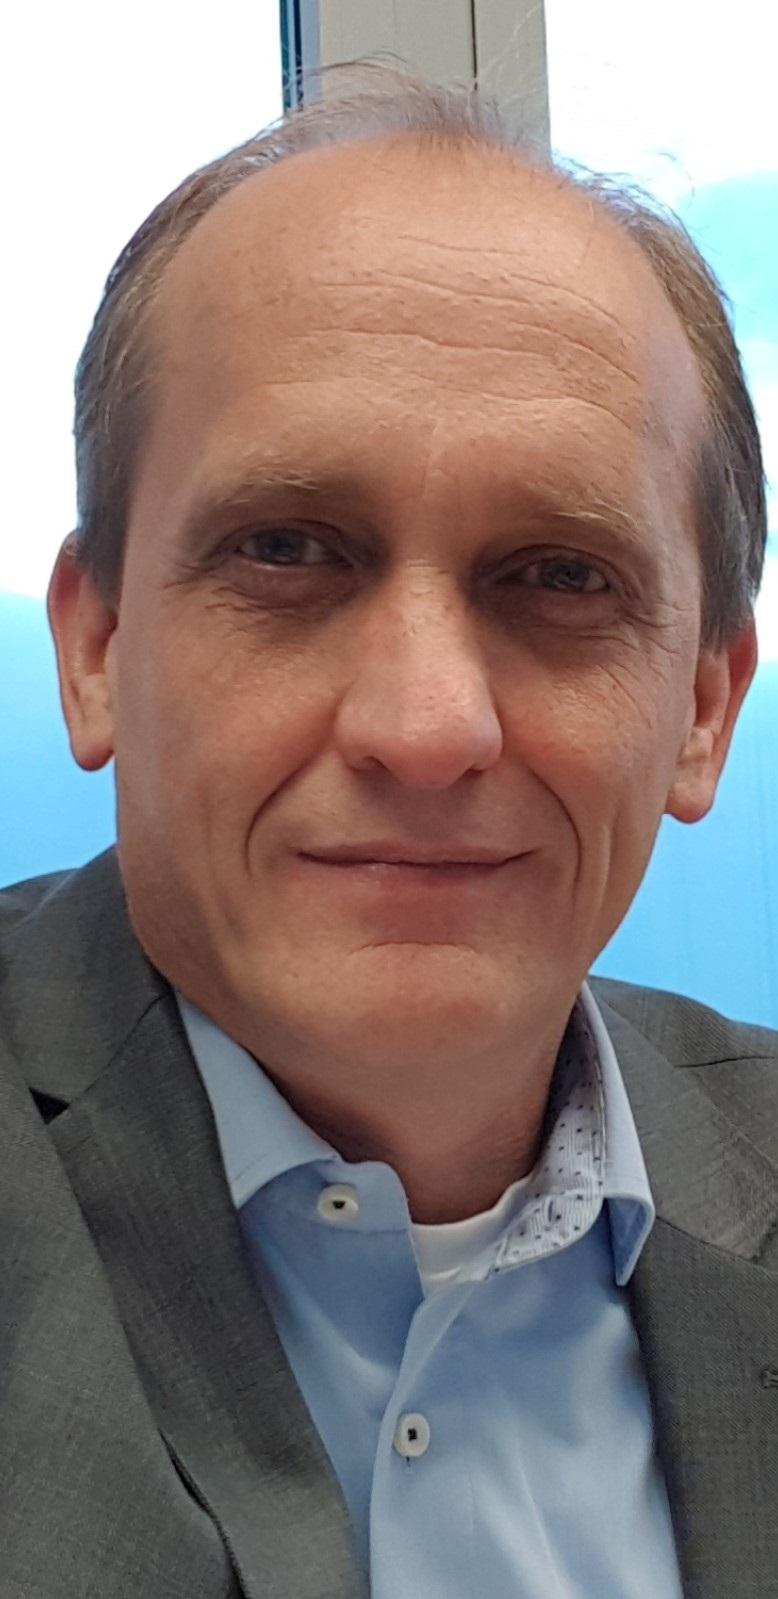 Christian Stefer, Bereichsleiter Smart Metering bei Heinz Lackmann